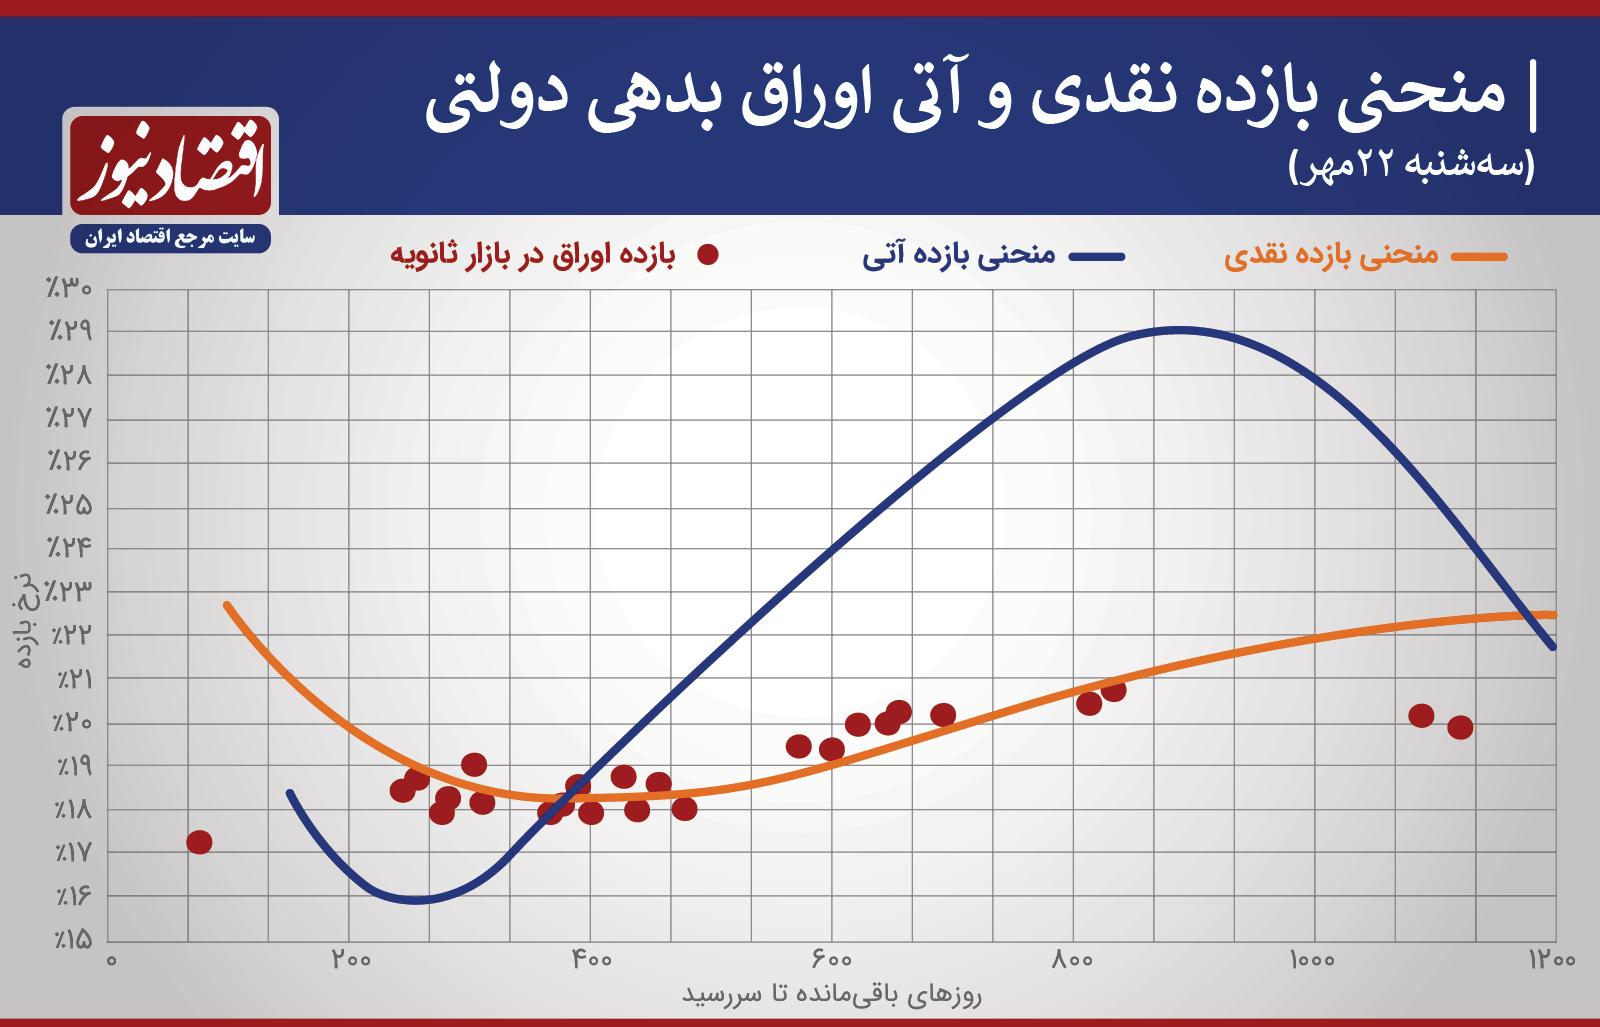 منحنی اوراق دولتی 22 مهر